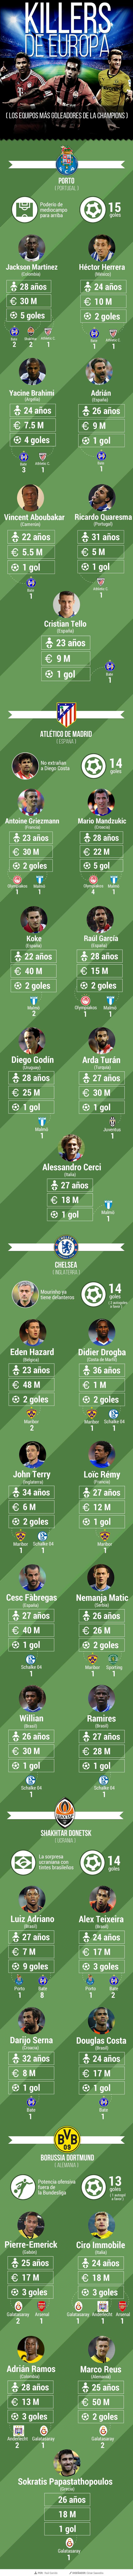 Goleadores de la Champions League 2014